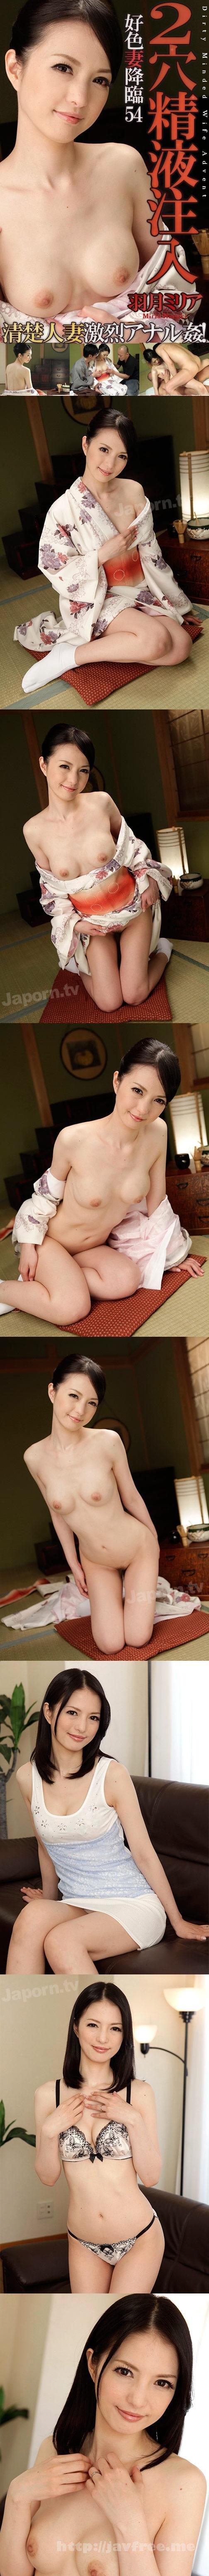 [SKY 323] 好色妻降臨 Vol.54 : 羽月ミリア 羽月ミリア SKY Miria Hazuki